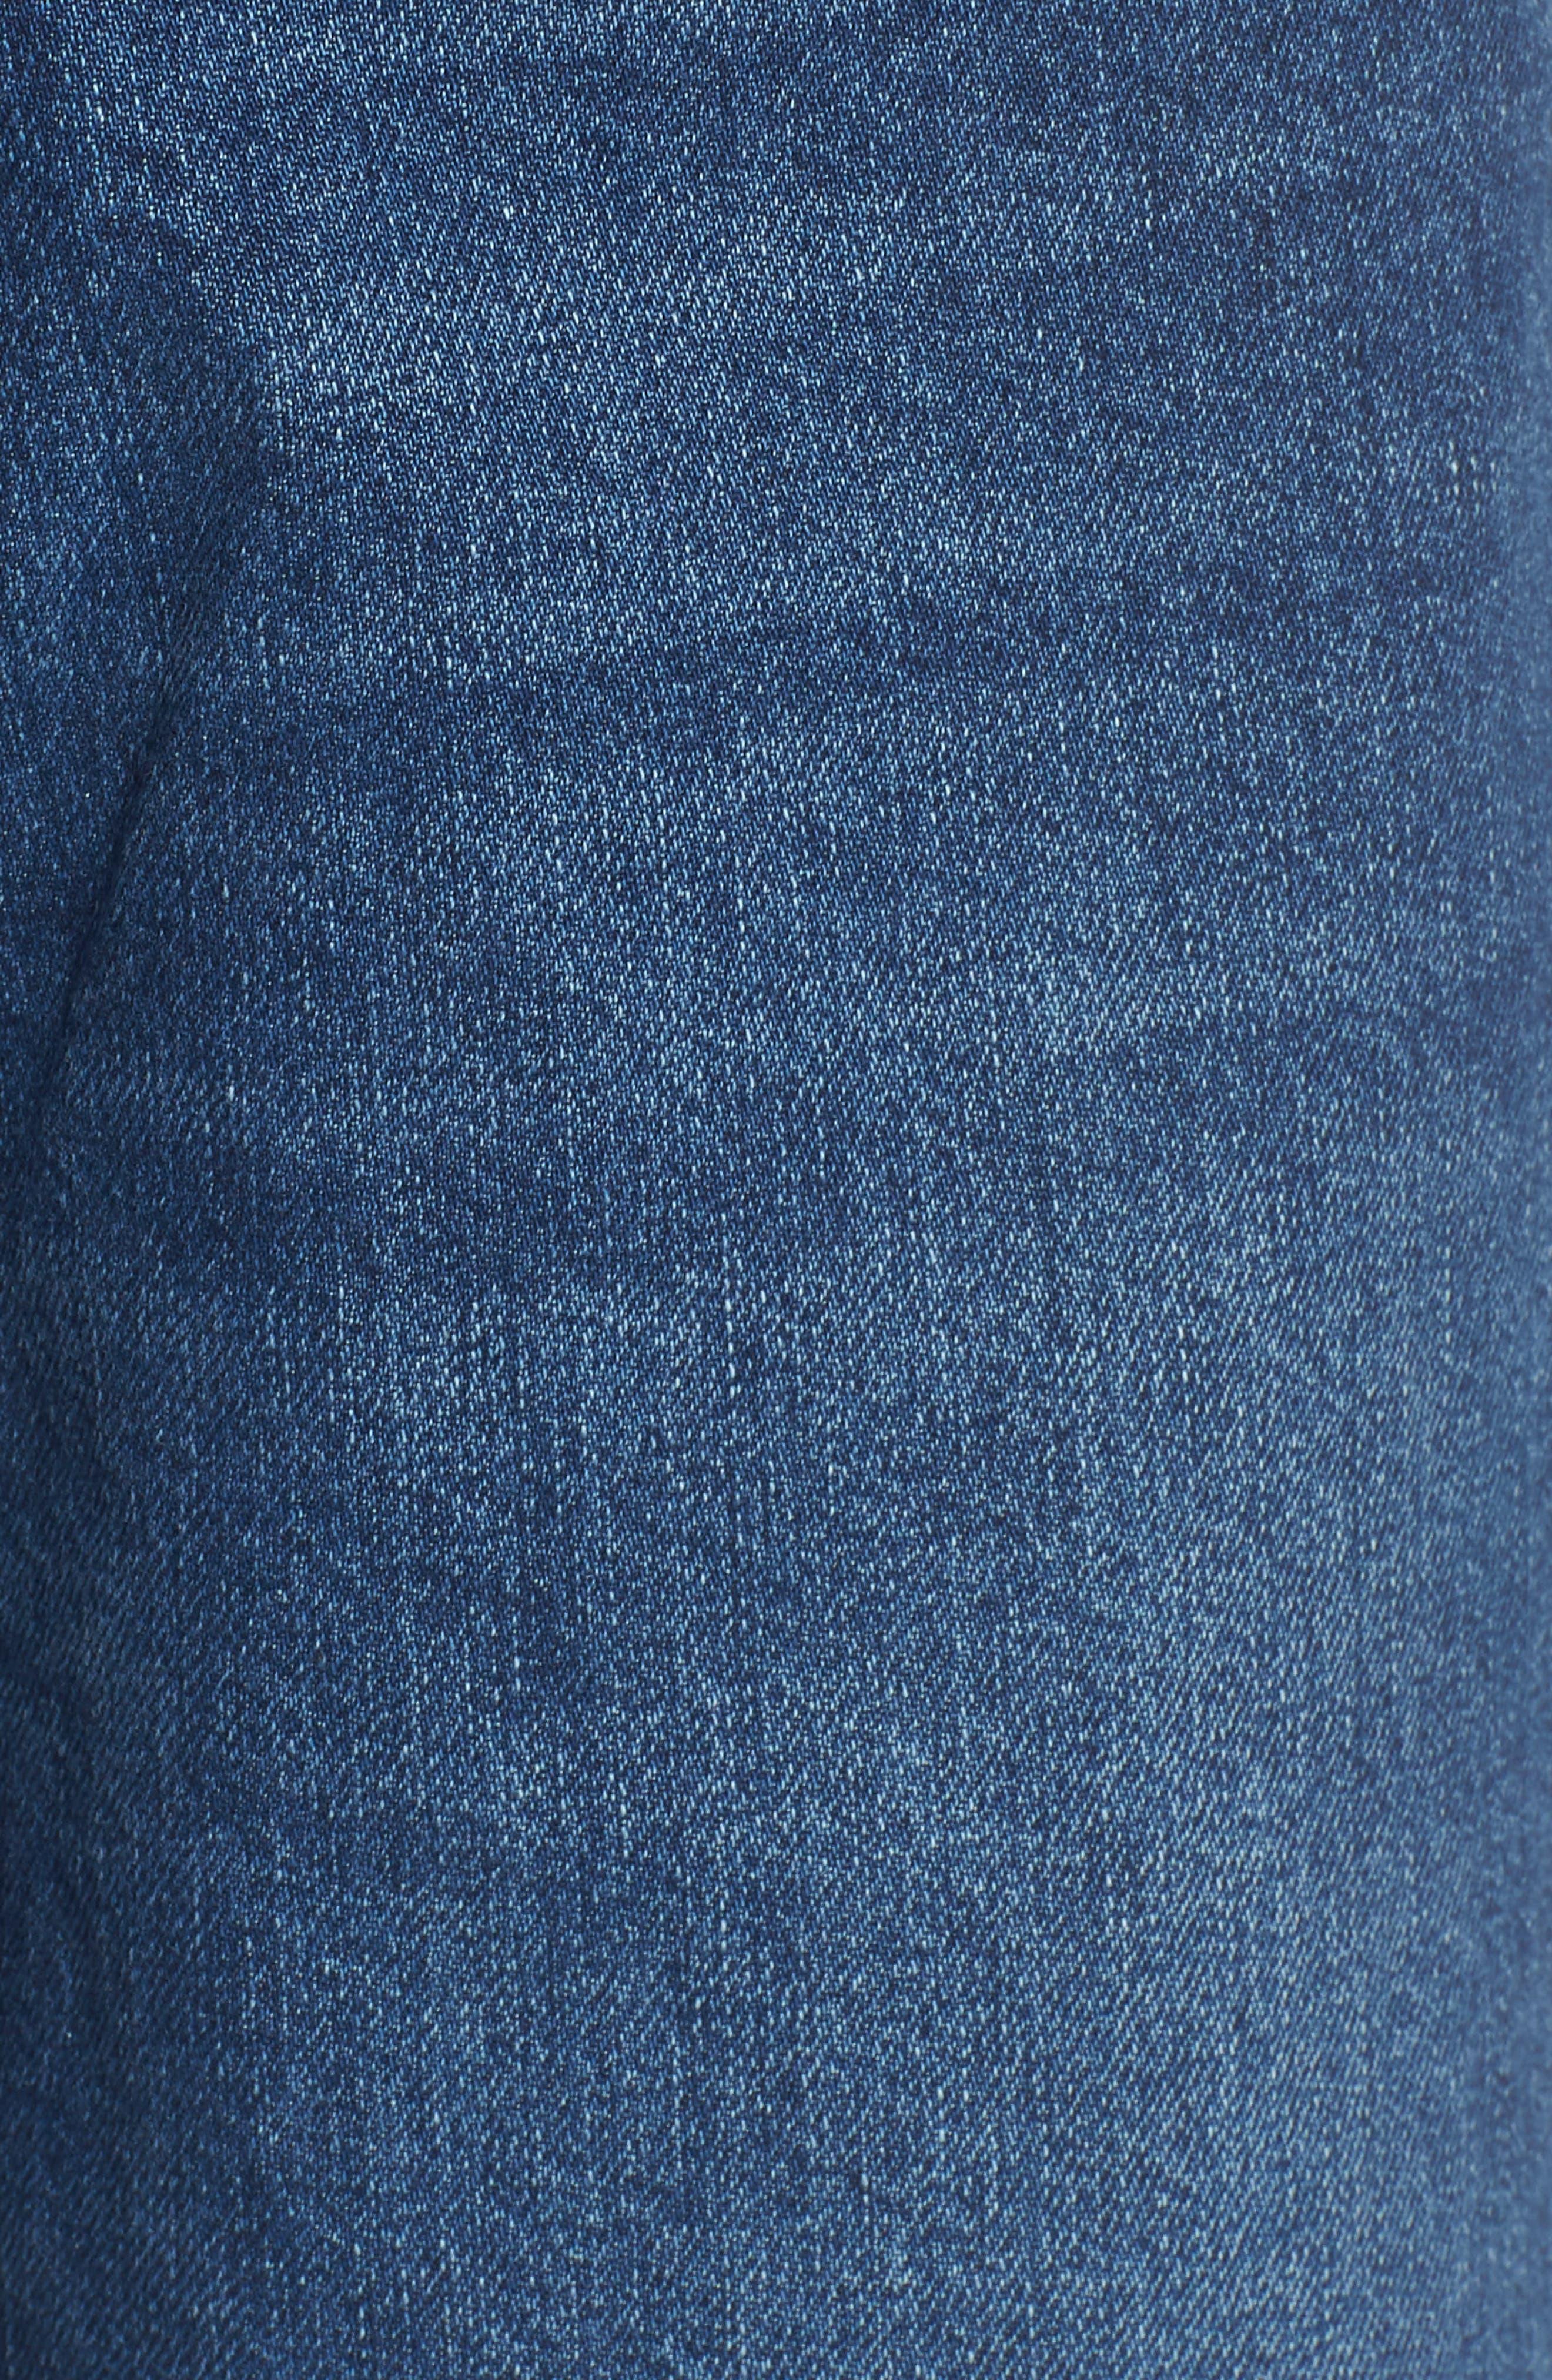 Hepburn High Waist Wide Leg Jeans,                             Alternate thumbnail 6, color,